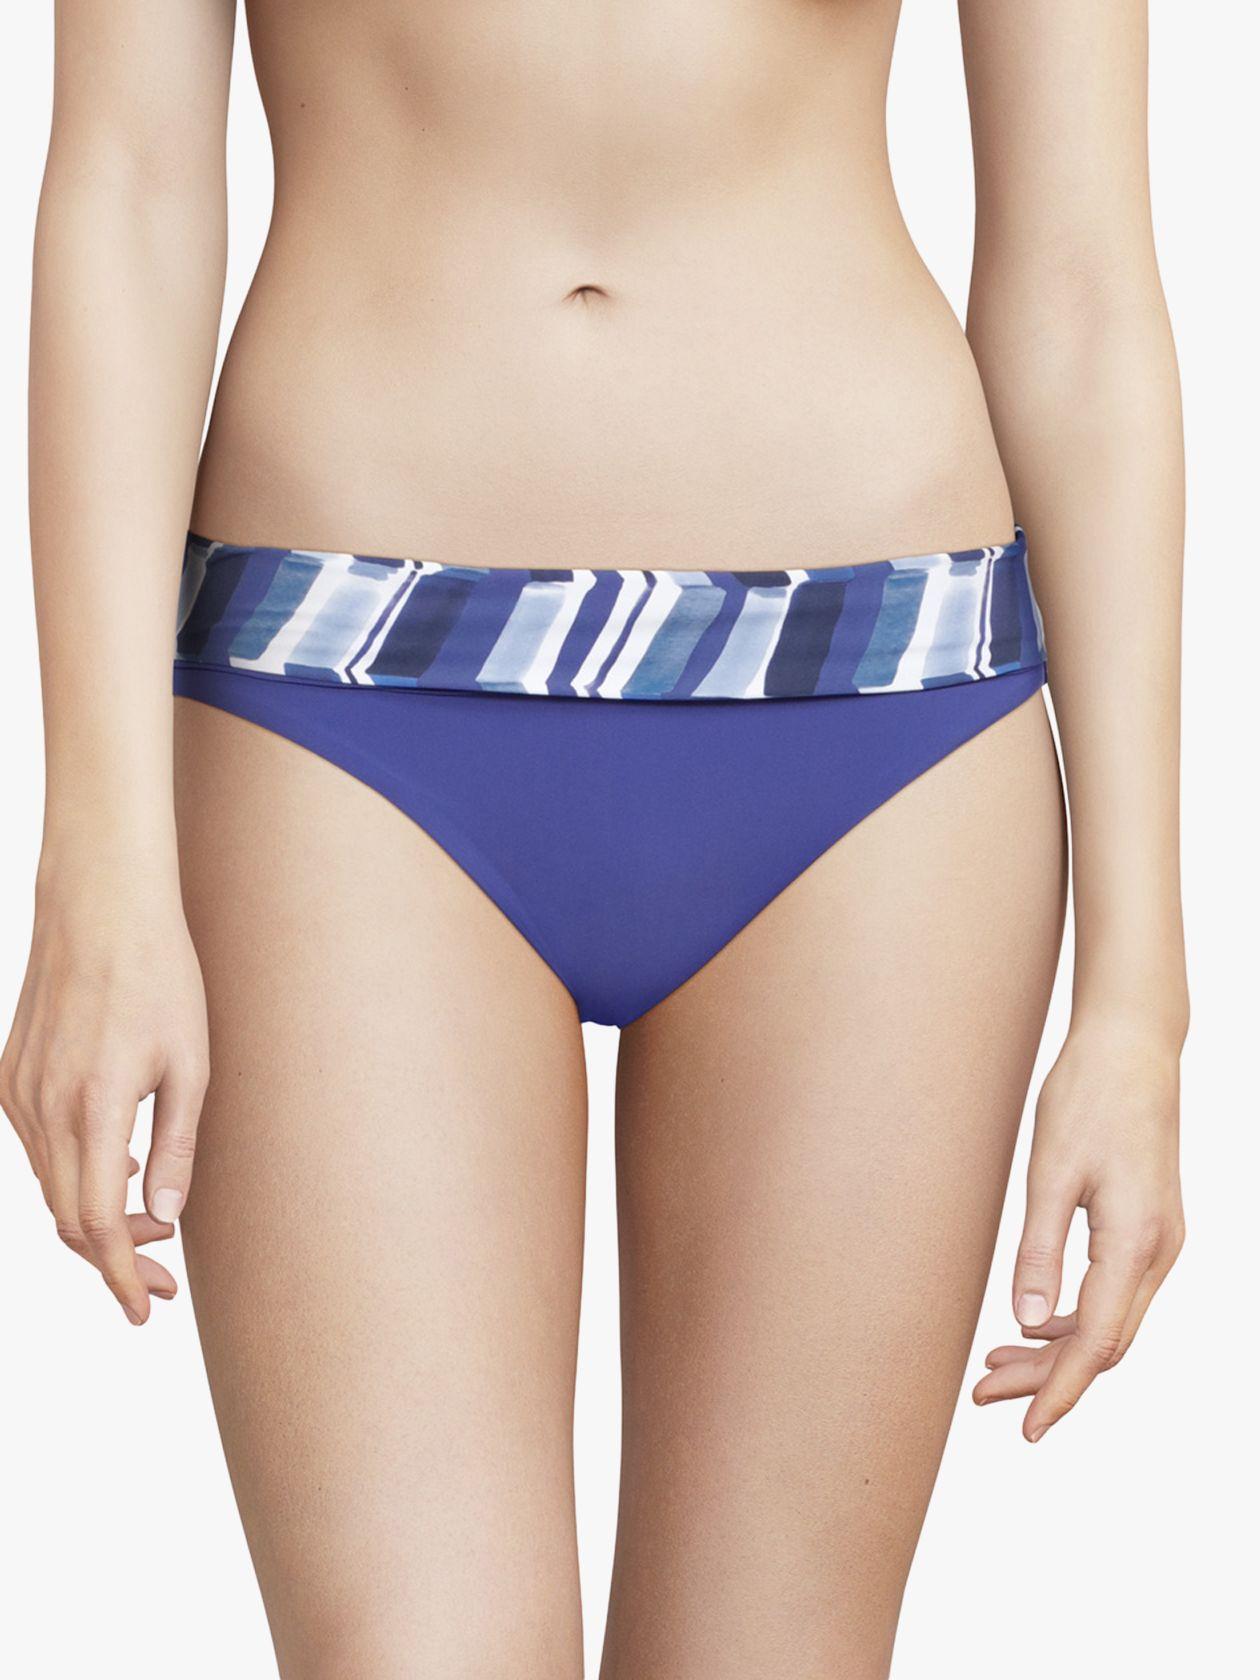 Chantelle Chantelle Deep Sea Waves Bikini Briefs, Blue